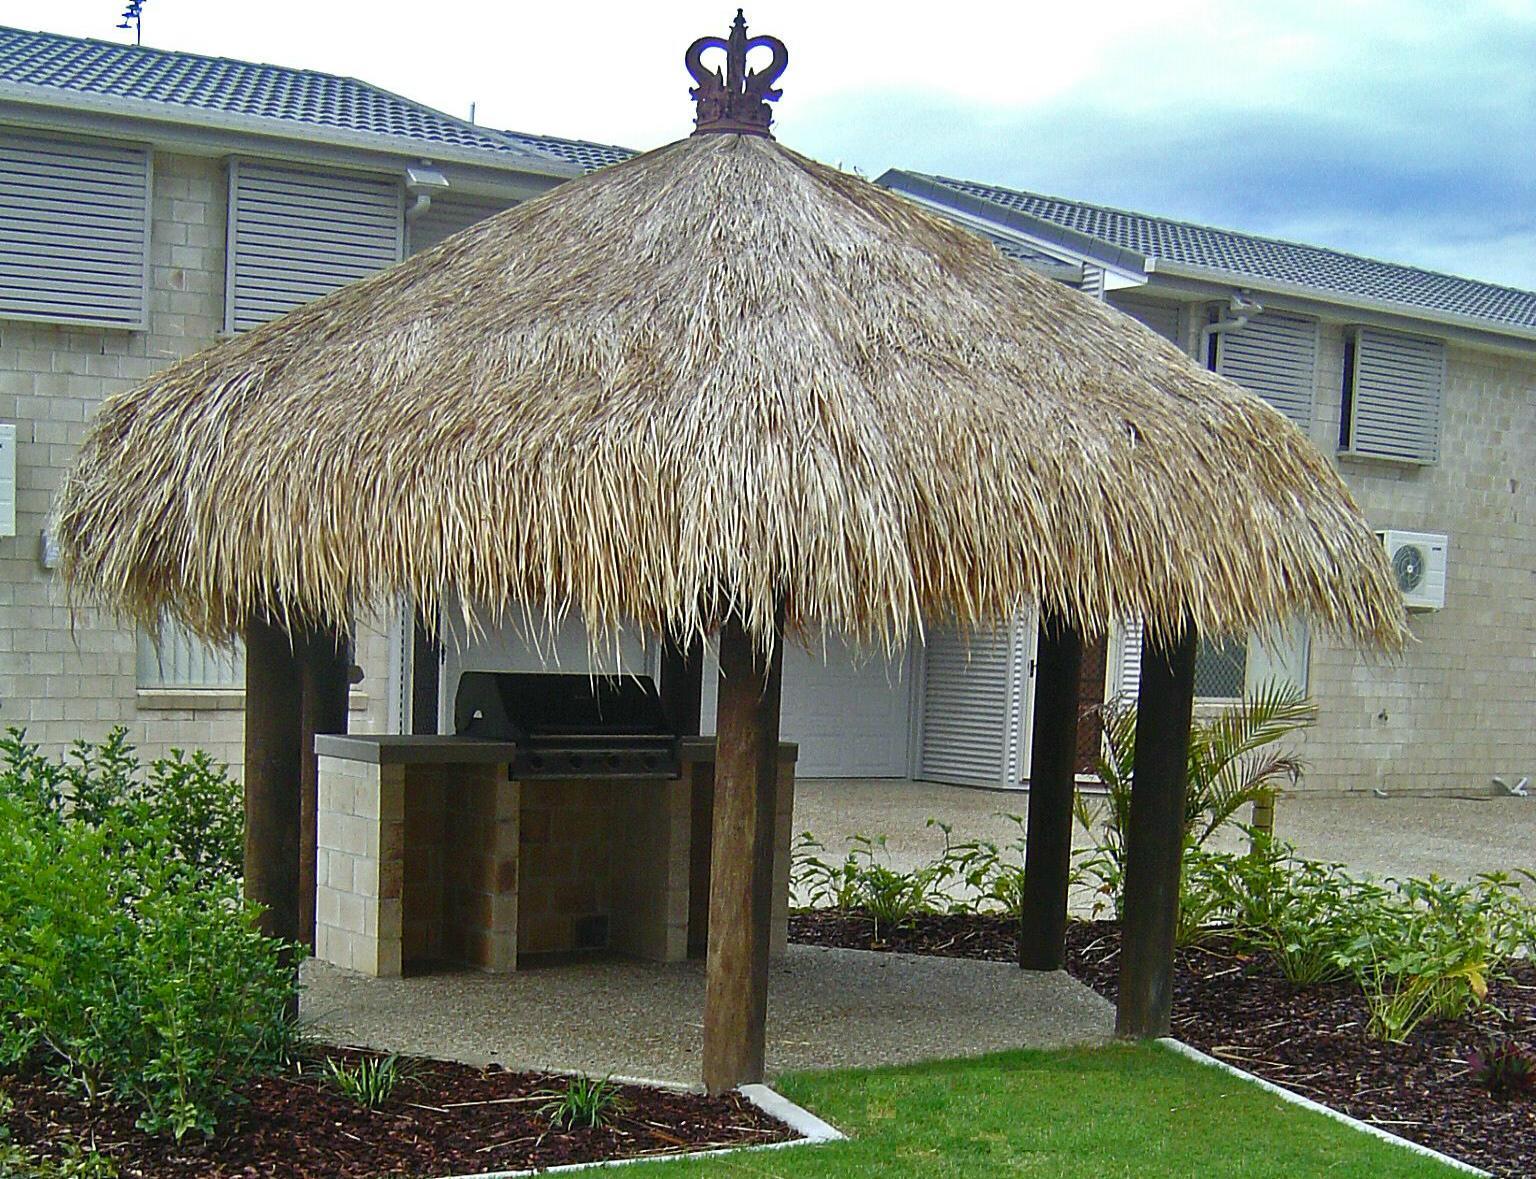 Bali Huts and Decks